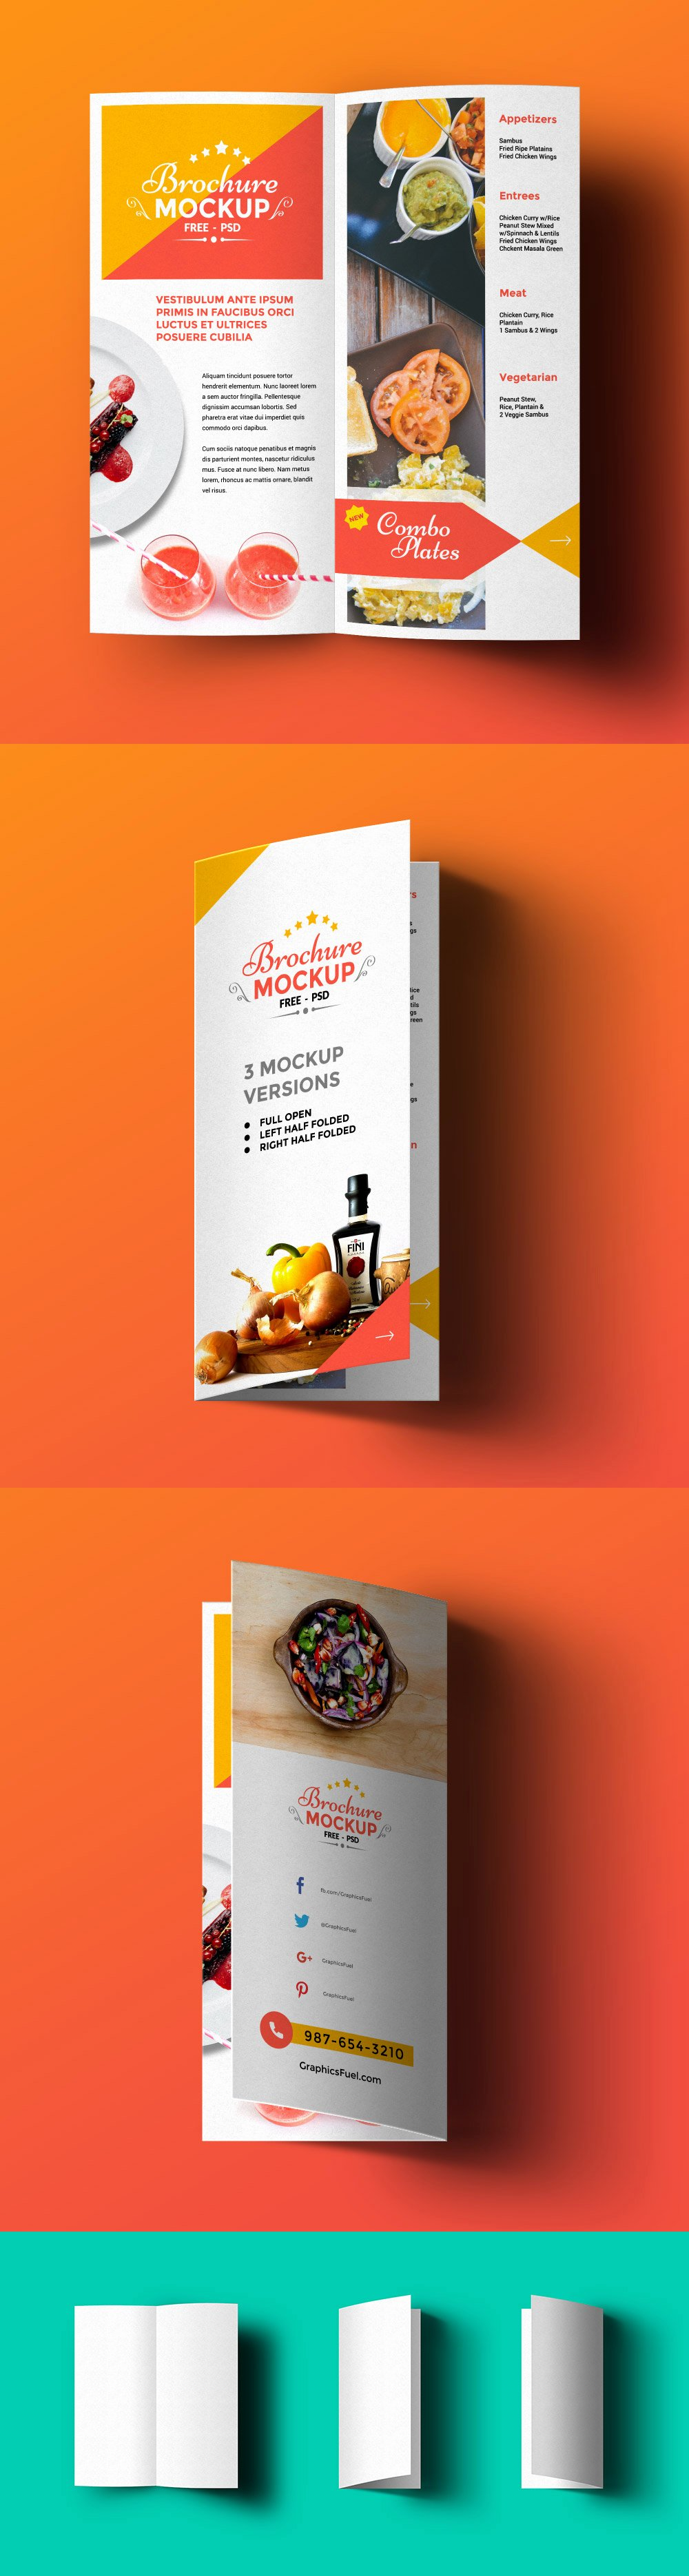 Free Bi Fold Brochure Psd Mockup Template Age themes